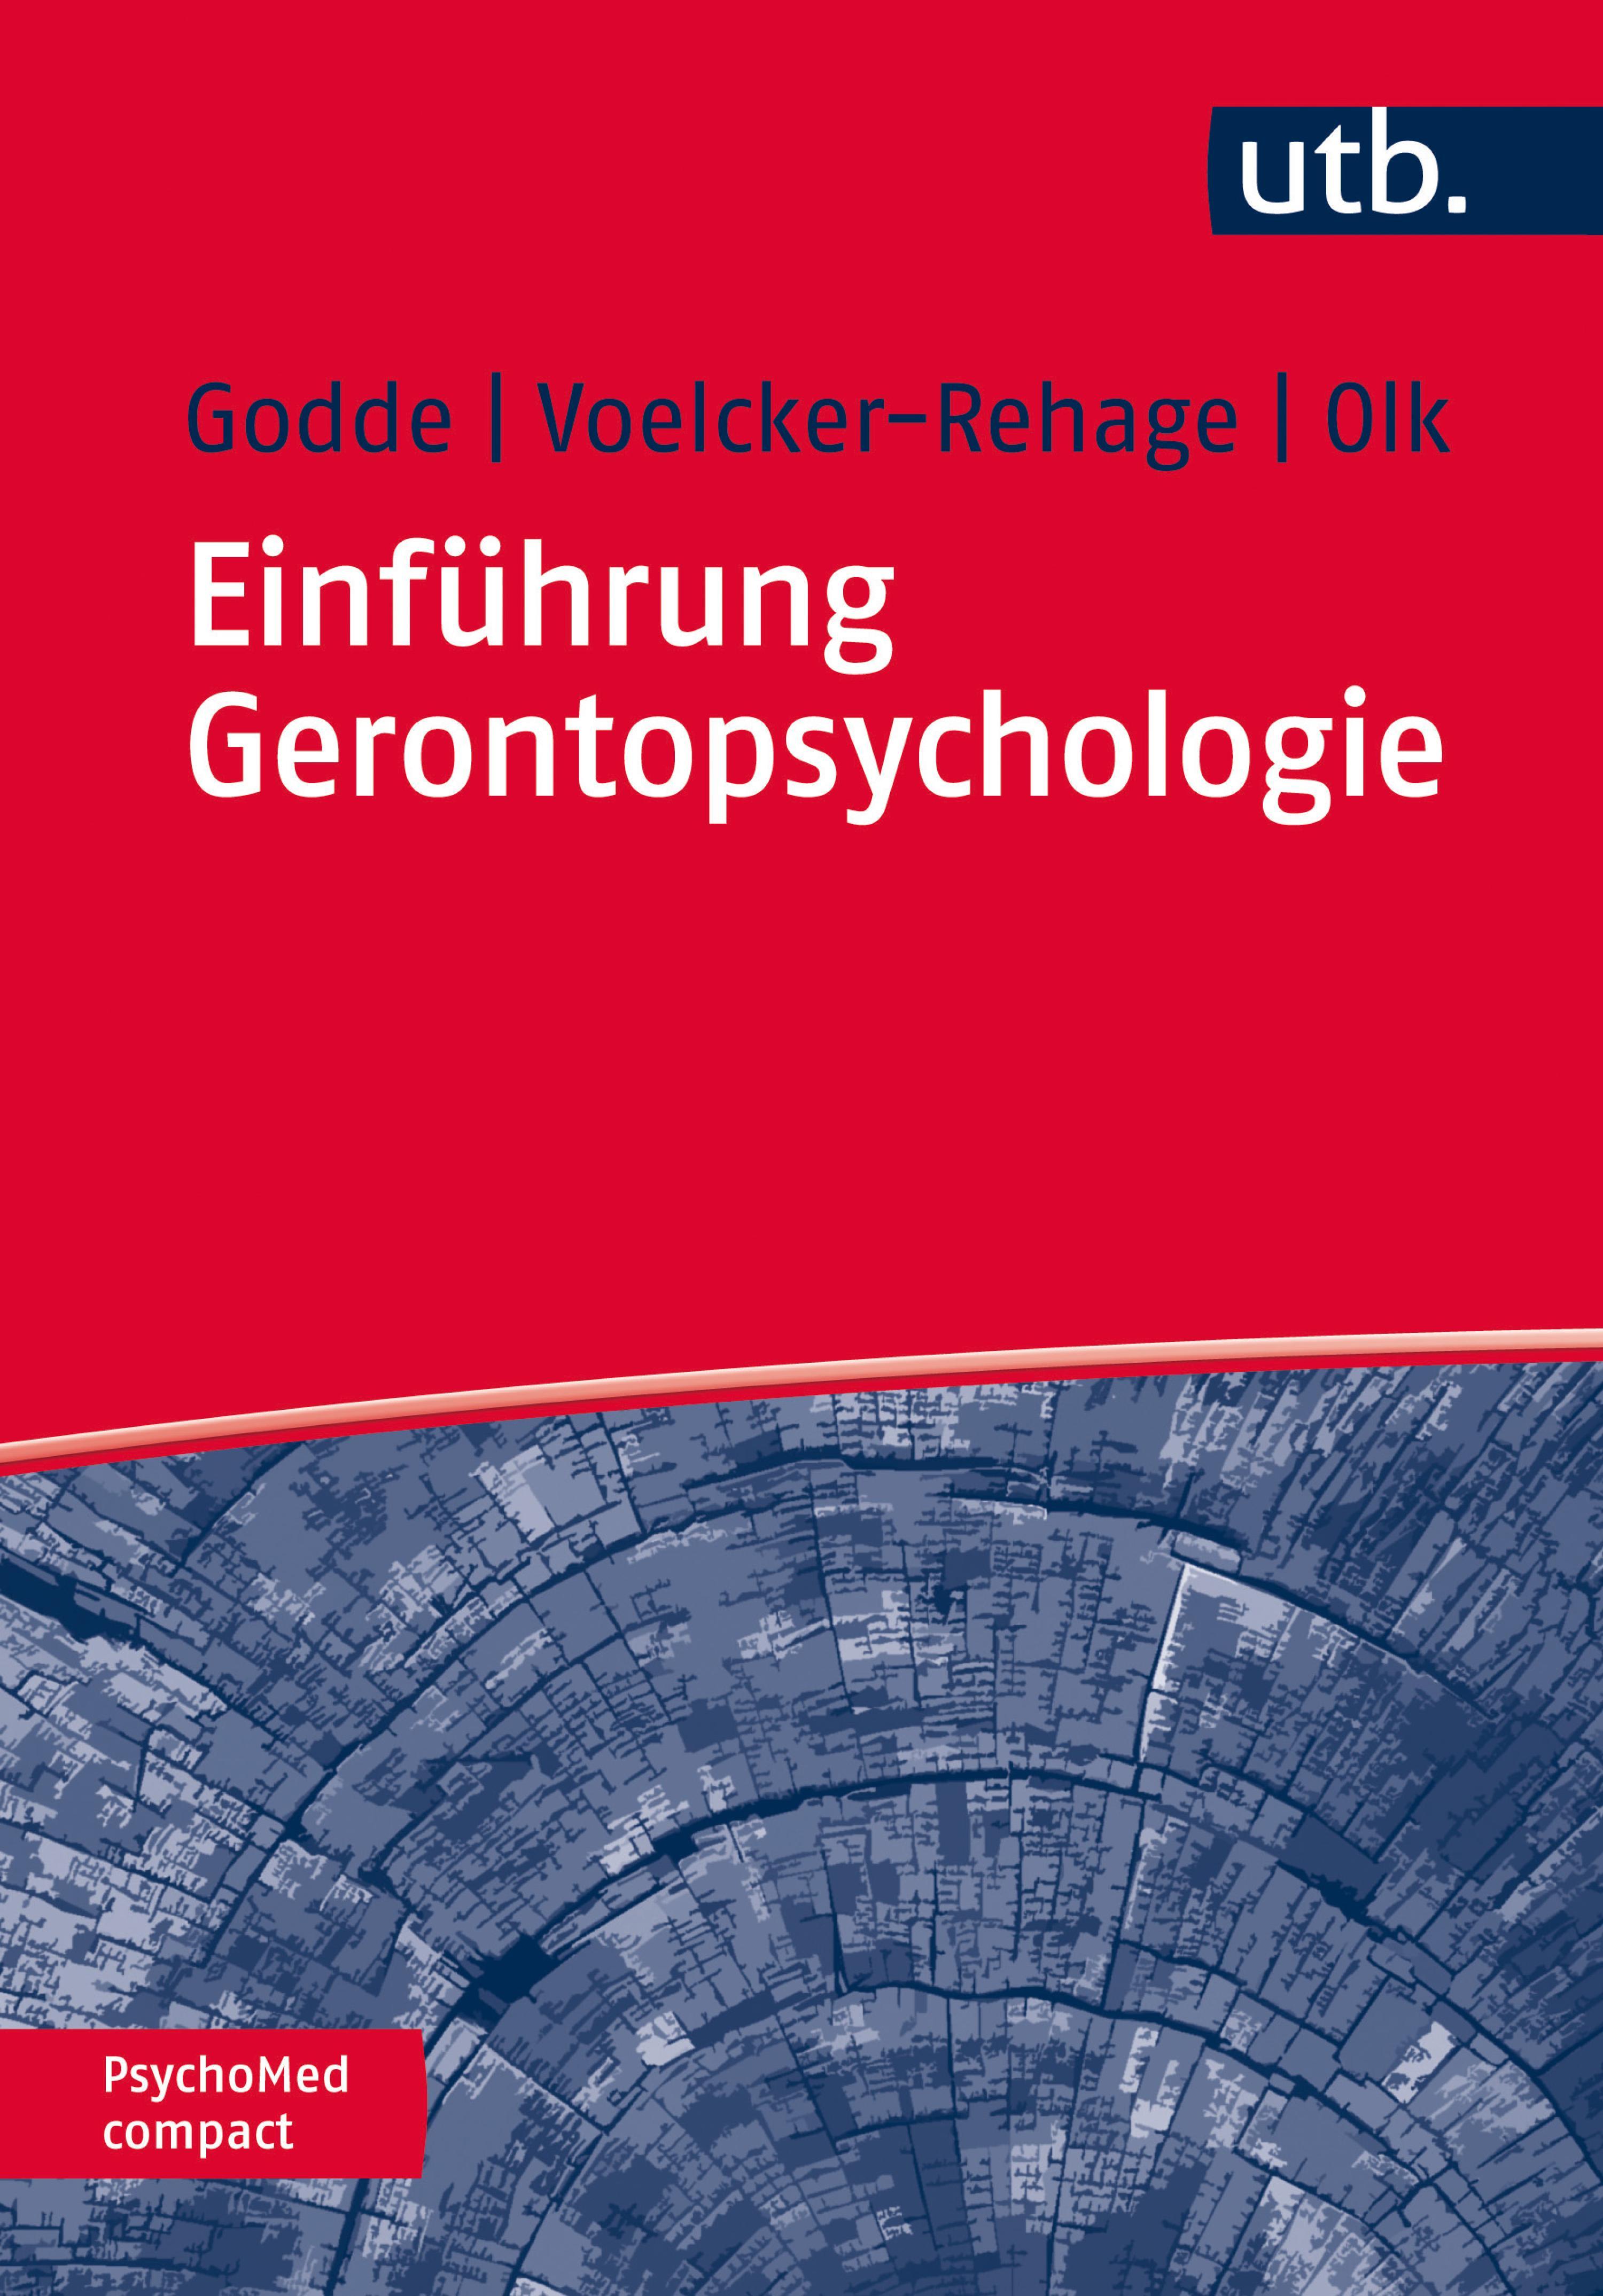 Einführung Gerontopsychologie